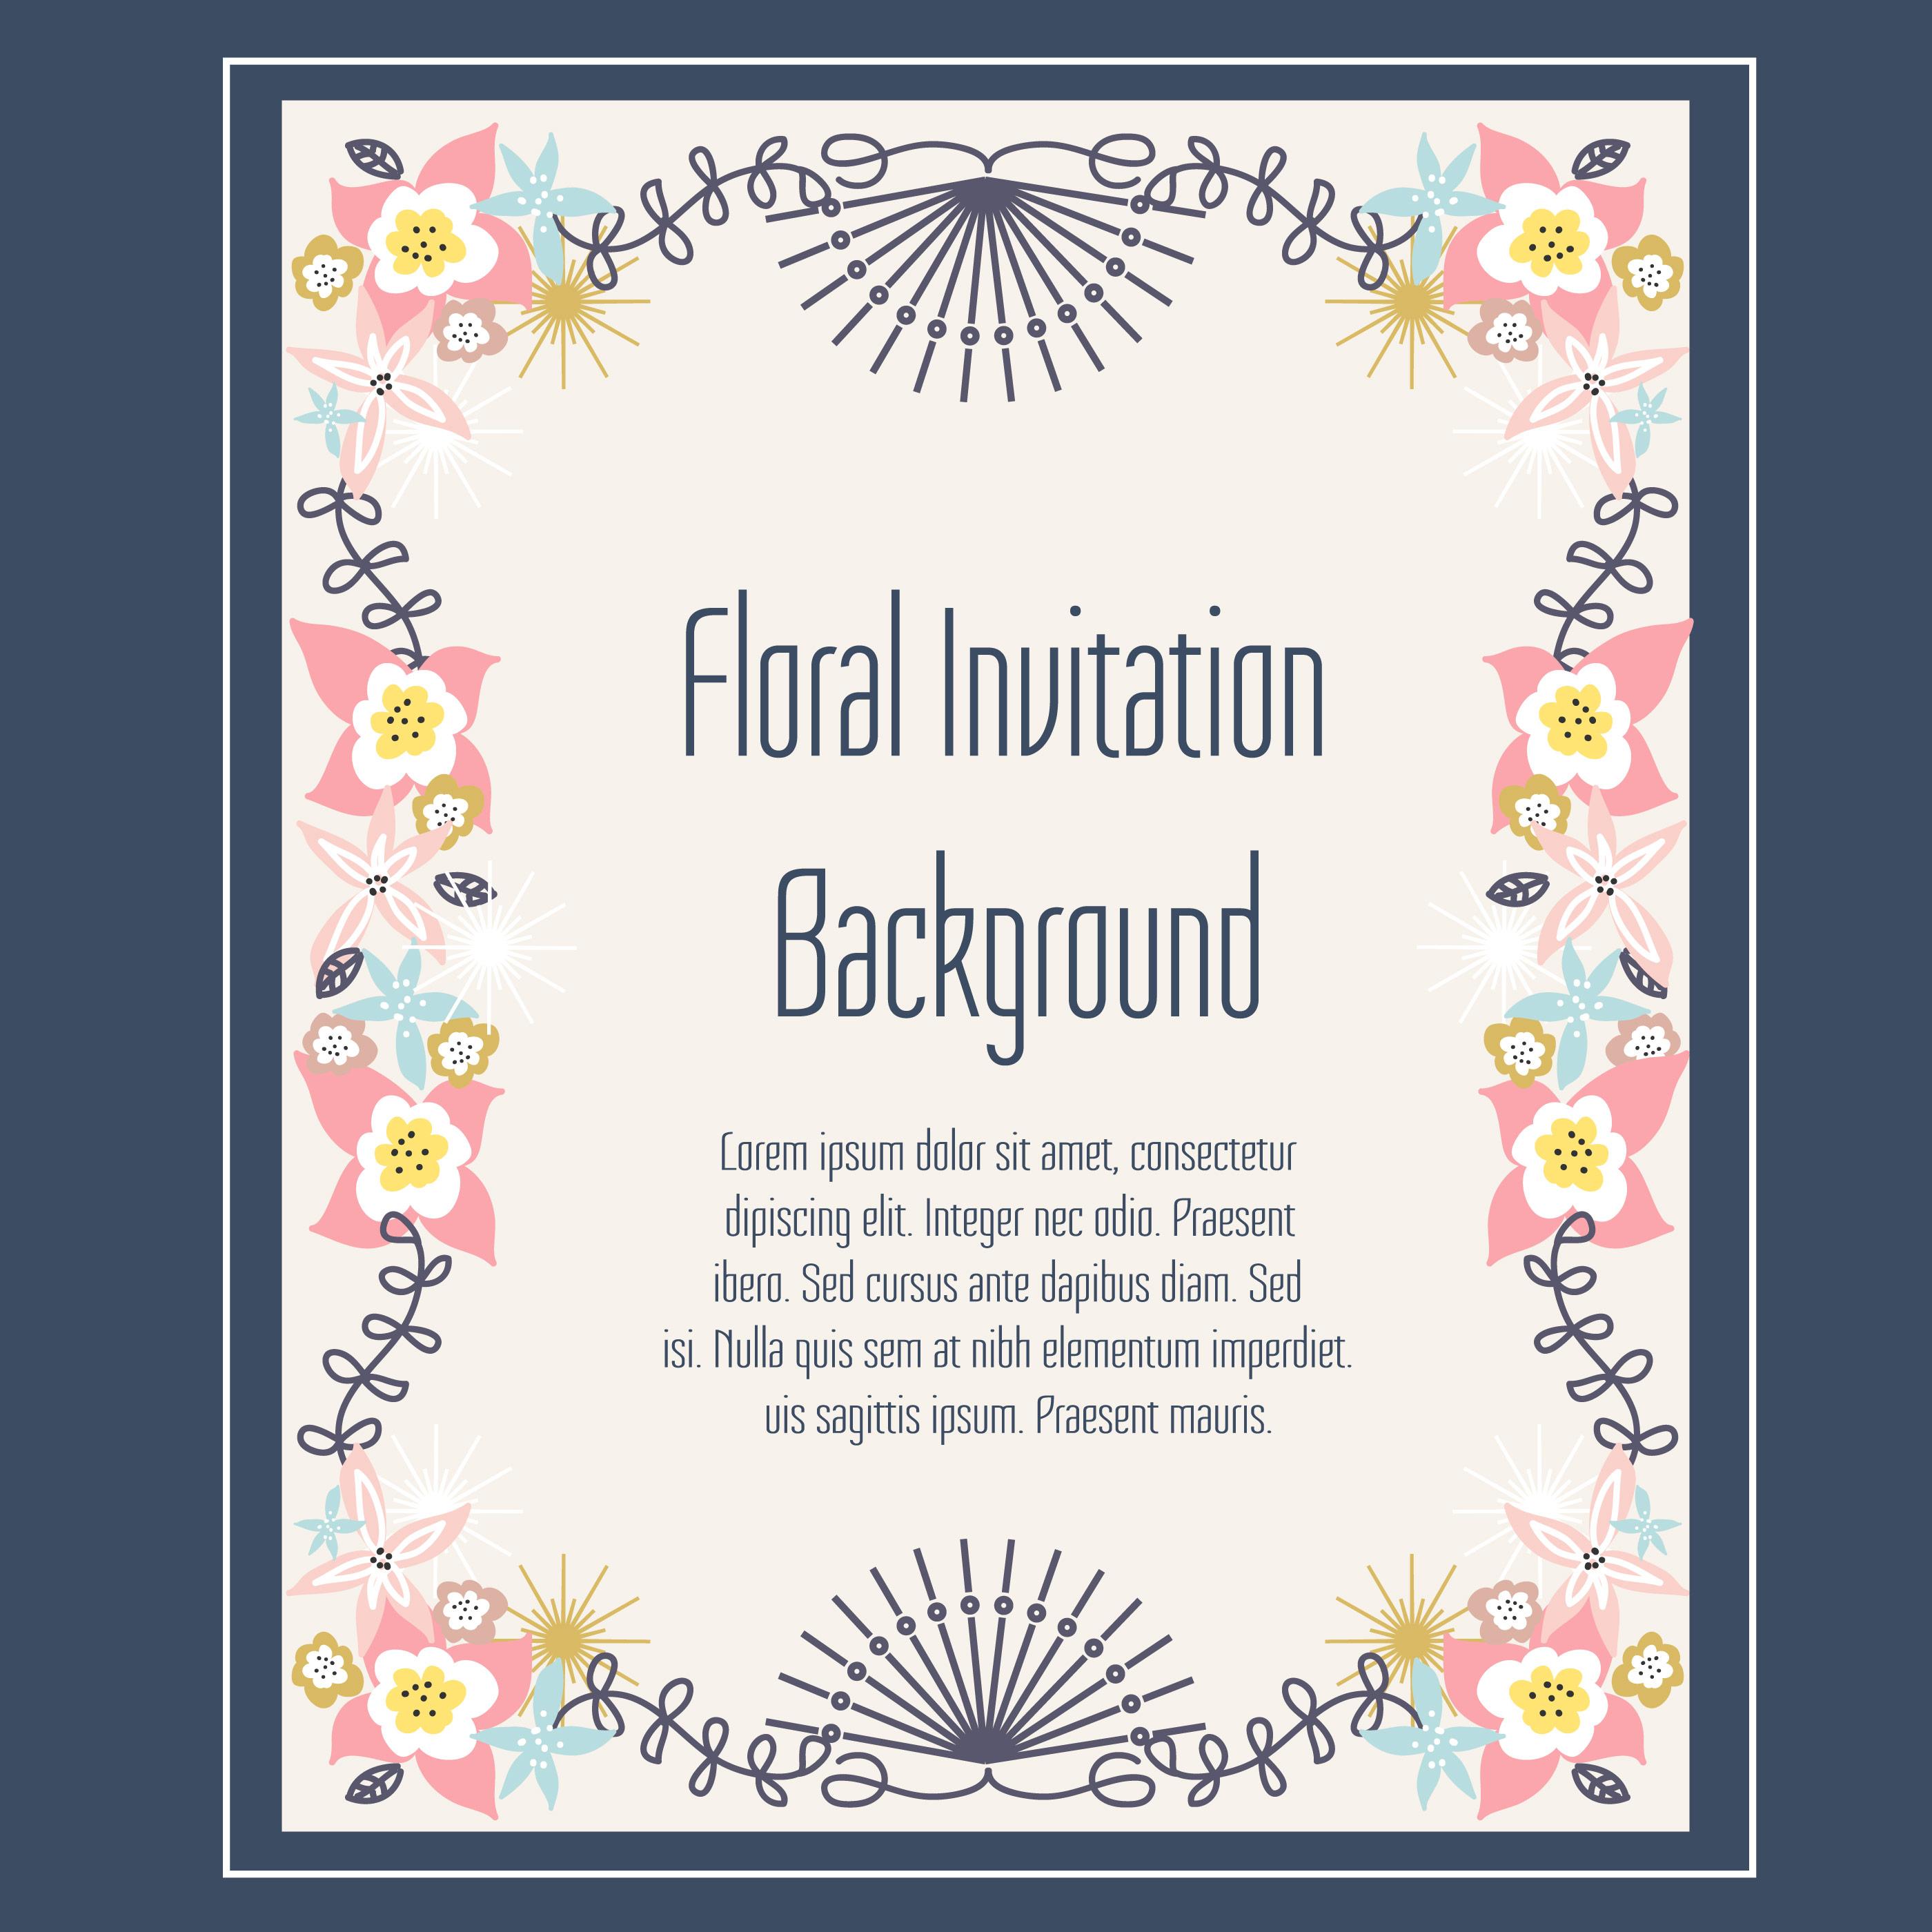 Floral Invitation Background Vector